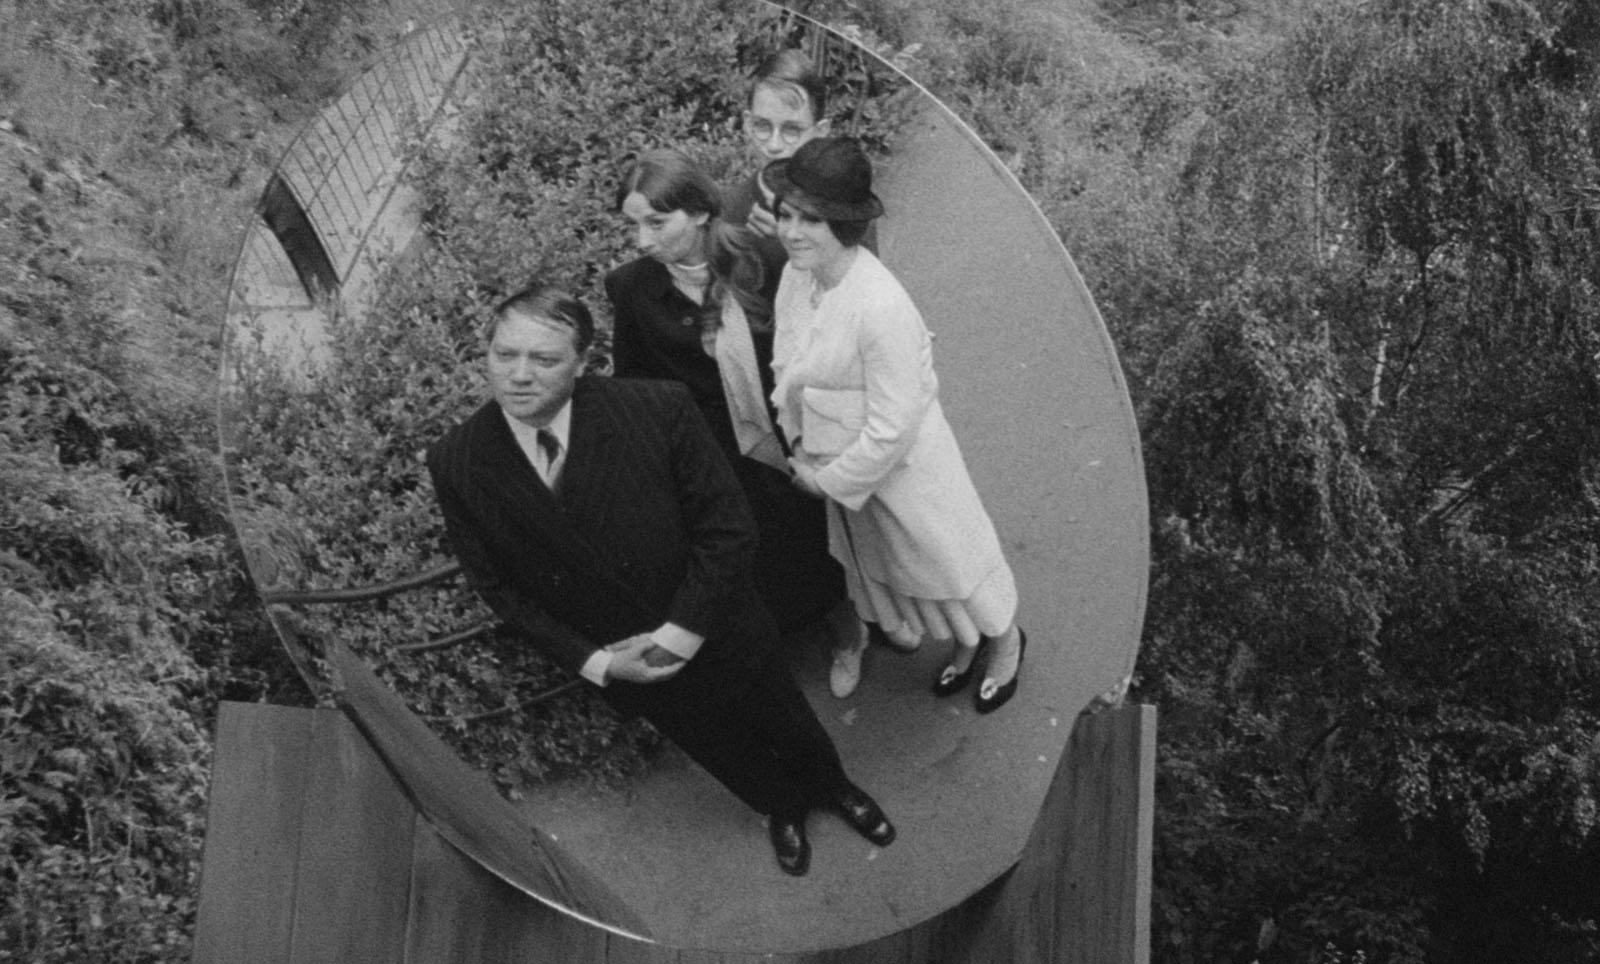 L'Incinérateur de Cadavres (1969)